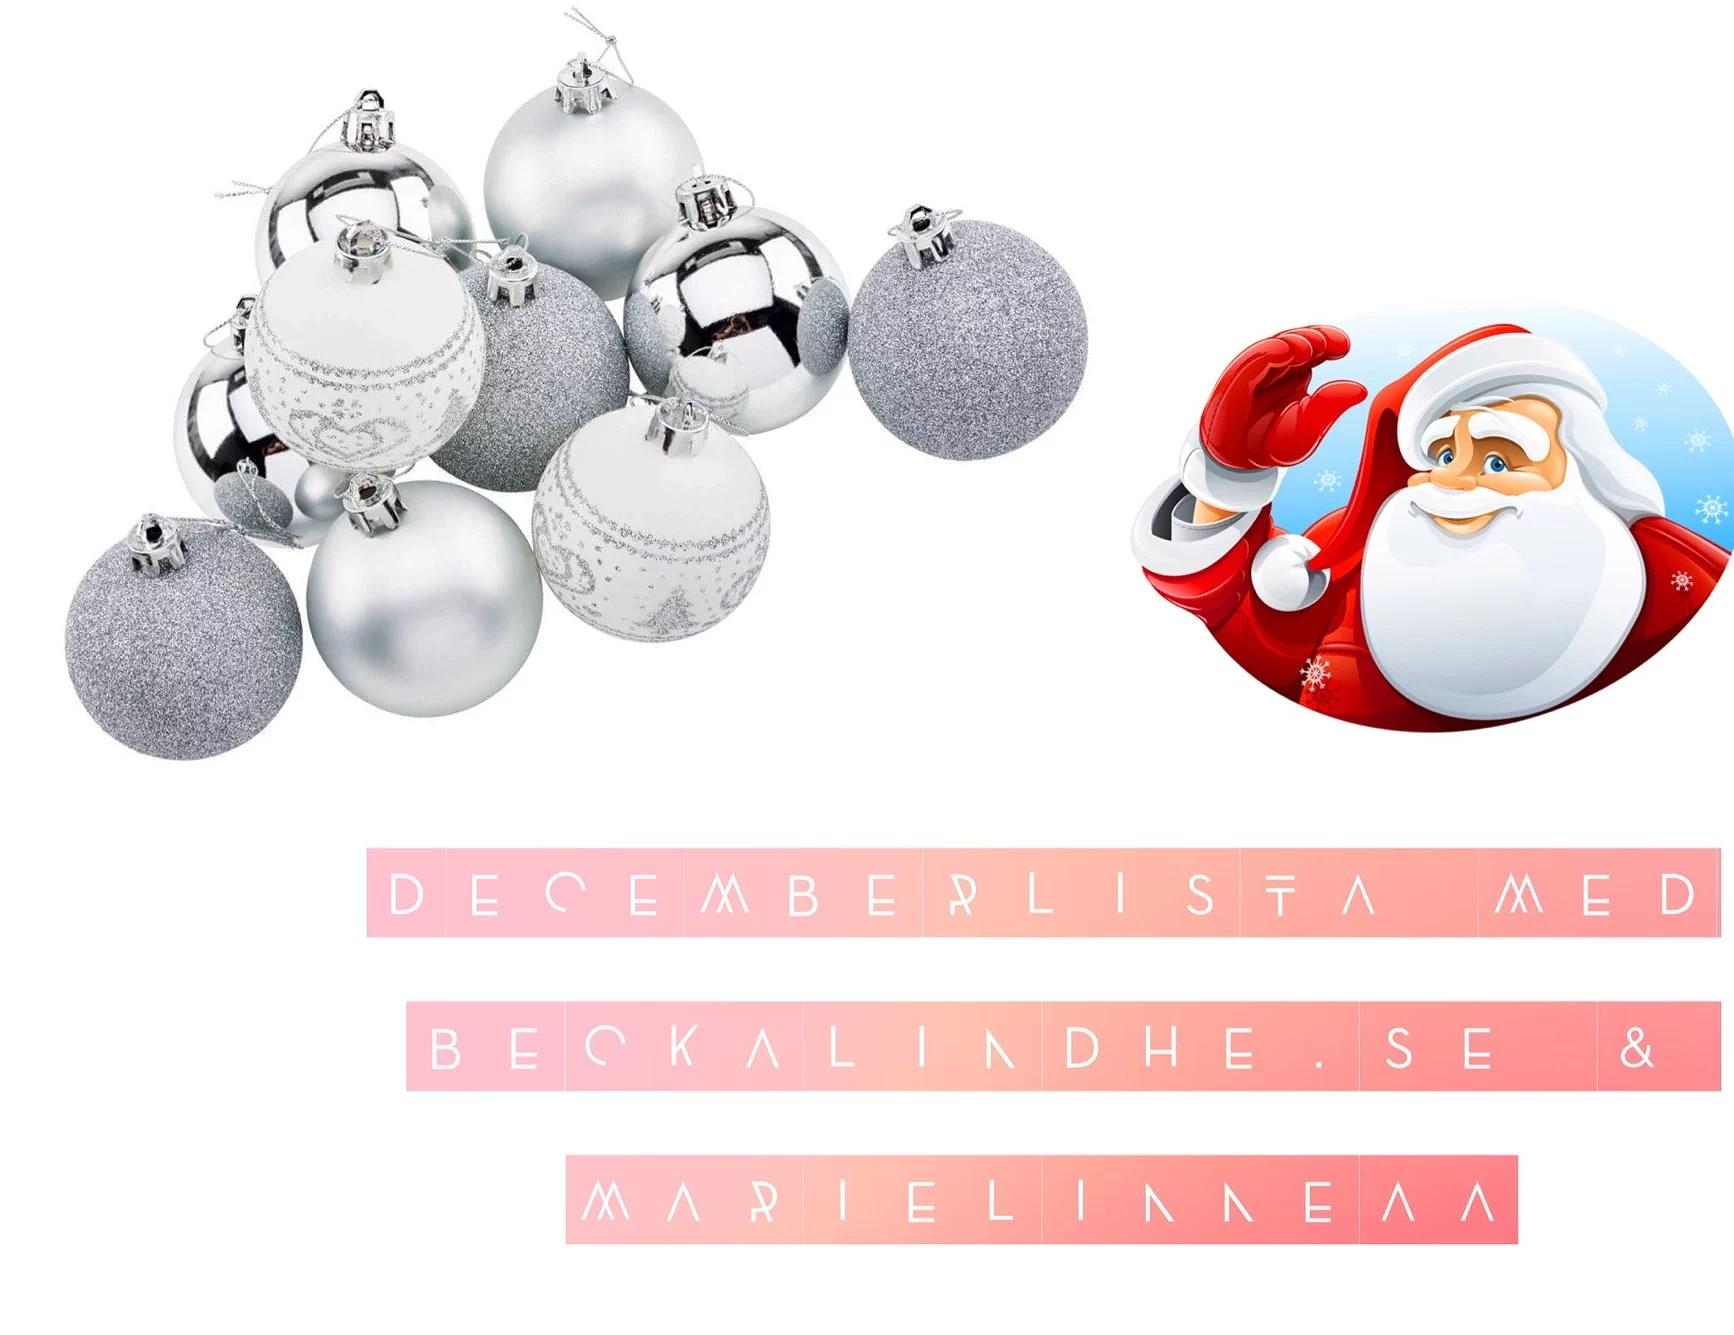 Decemberlista dag 15